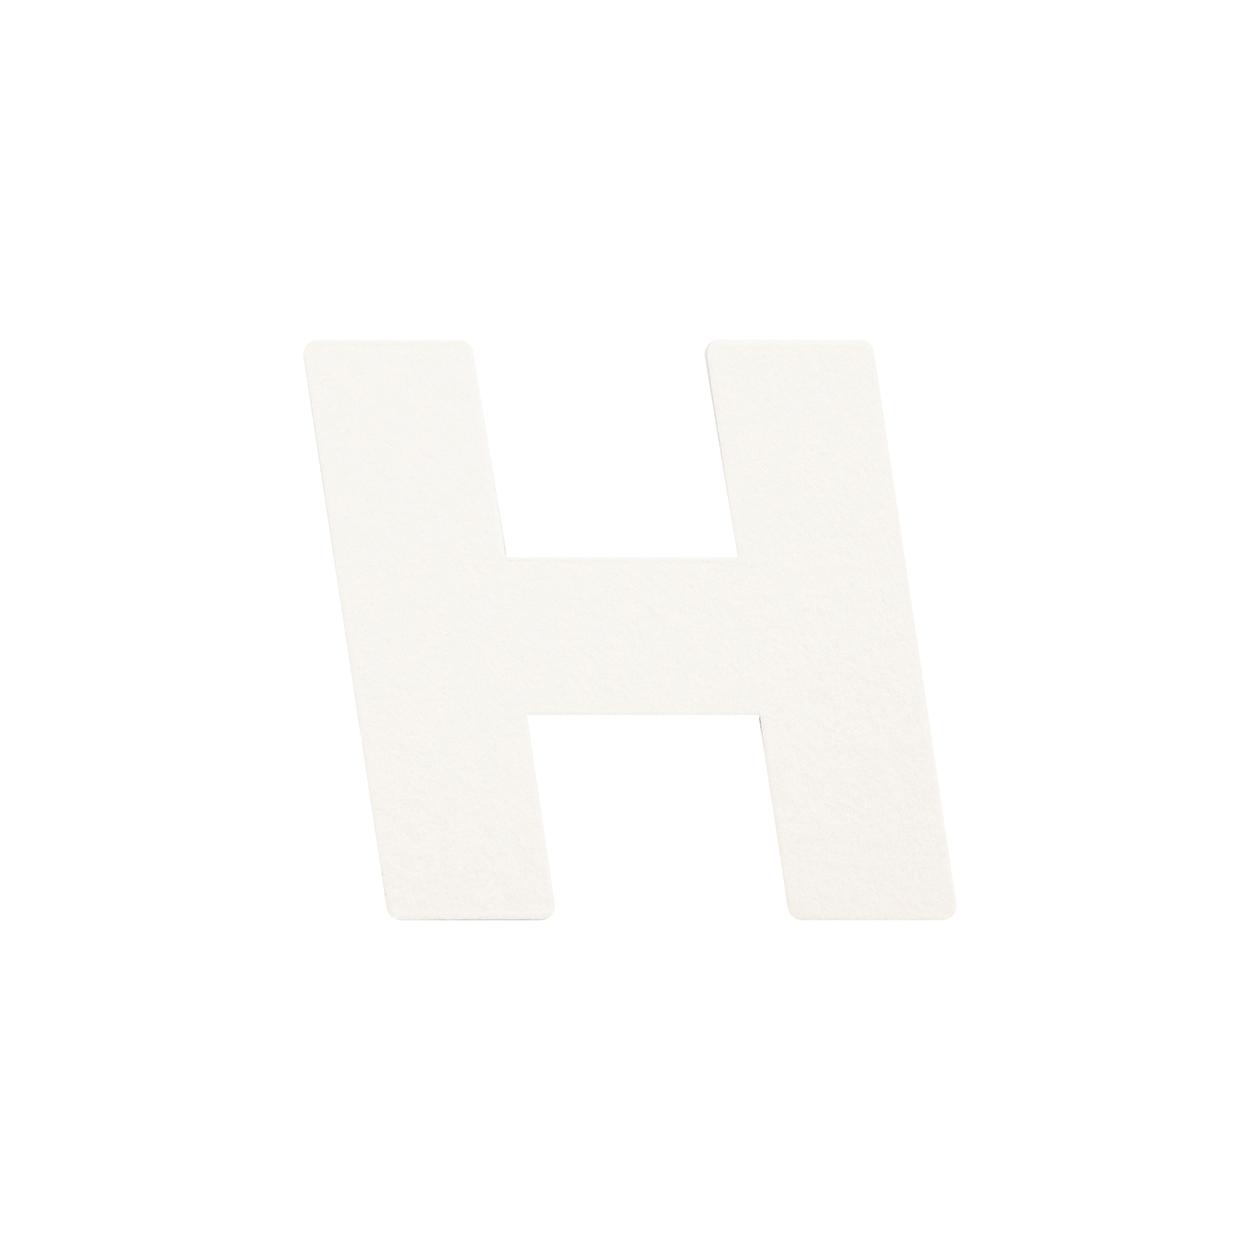 No.395ボード A7カードDC 文字H シルバー